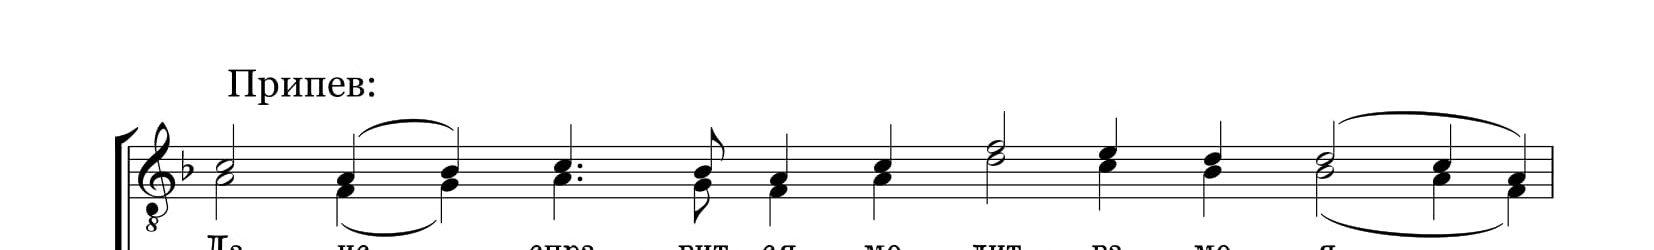 Да исправится (музыка прот. П. Турчанинова и. А.)